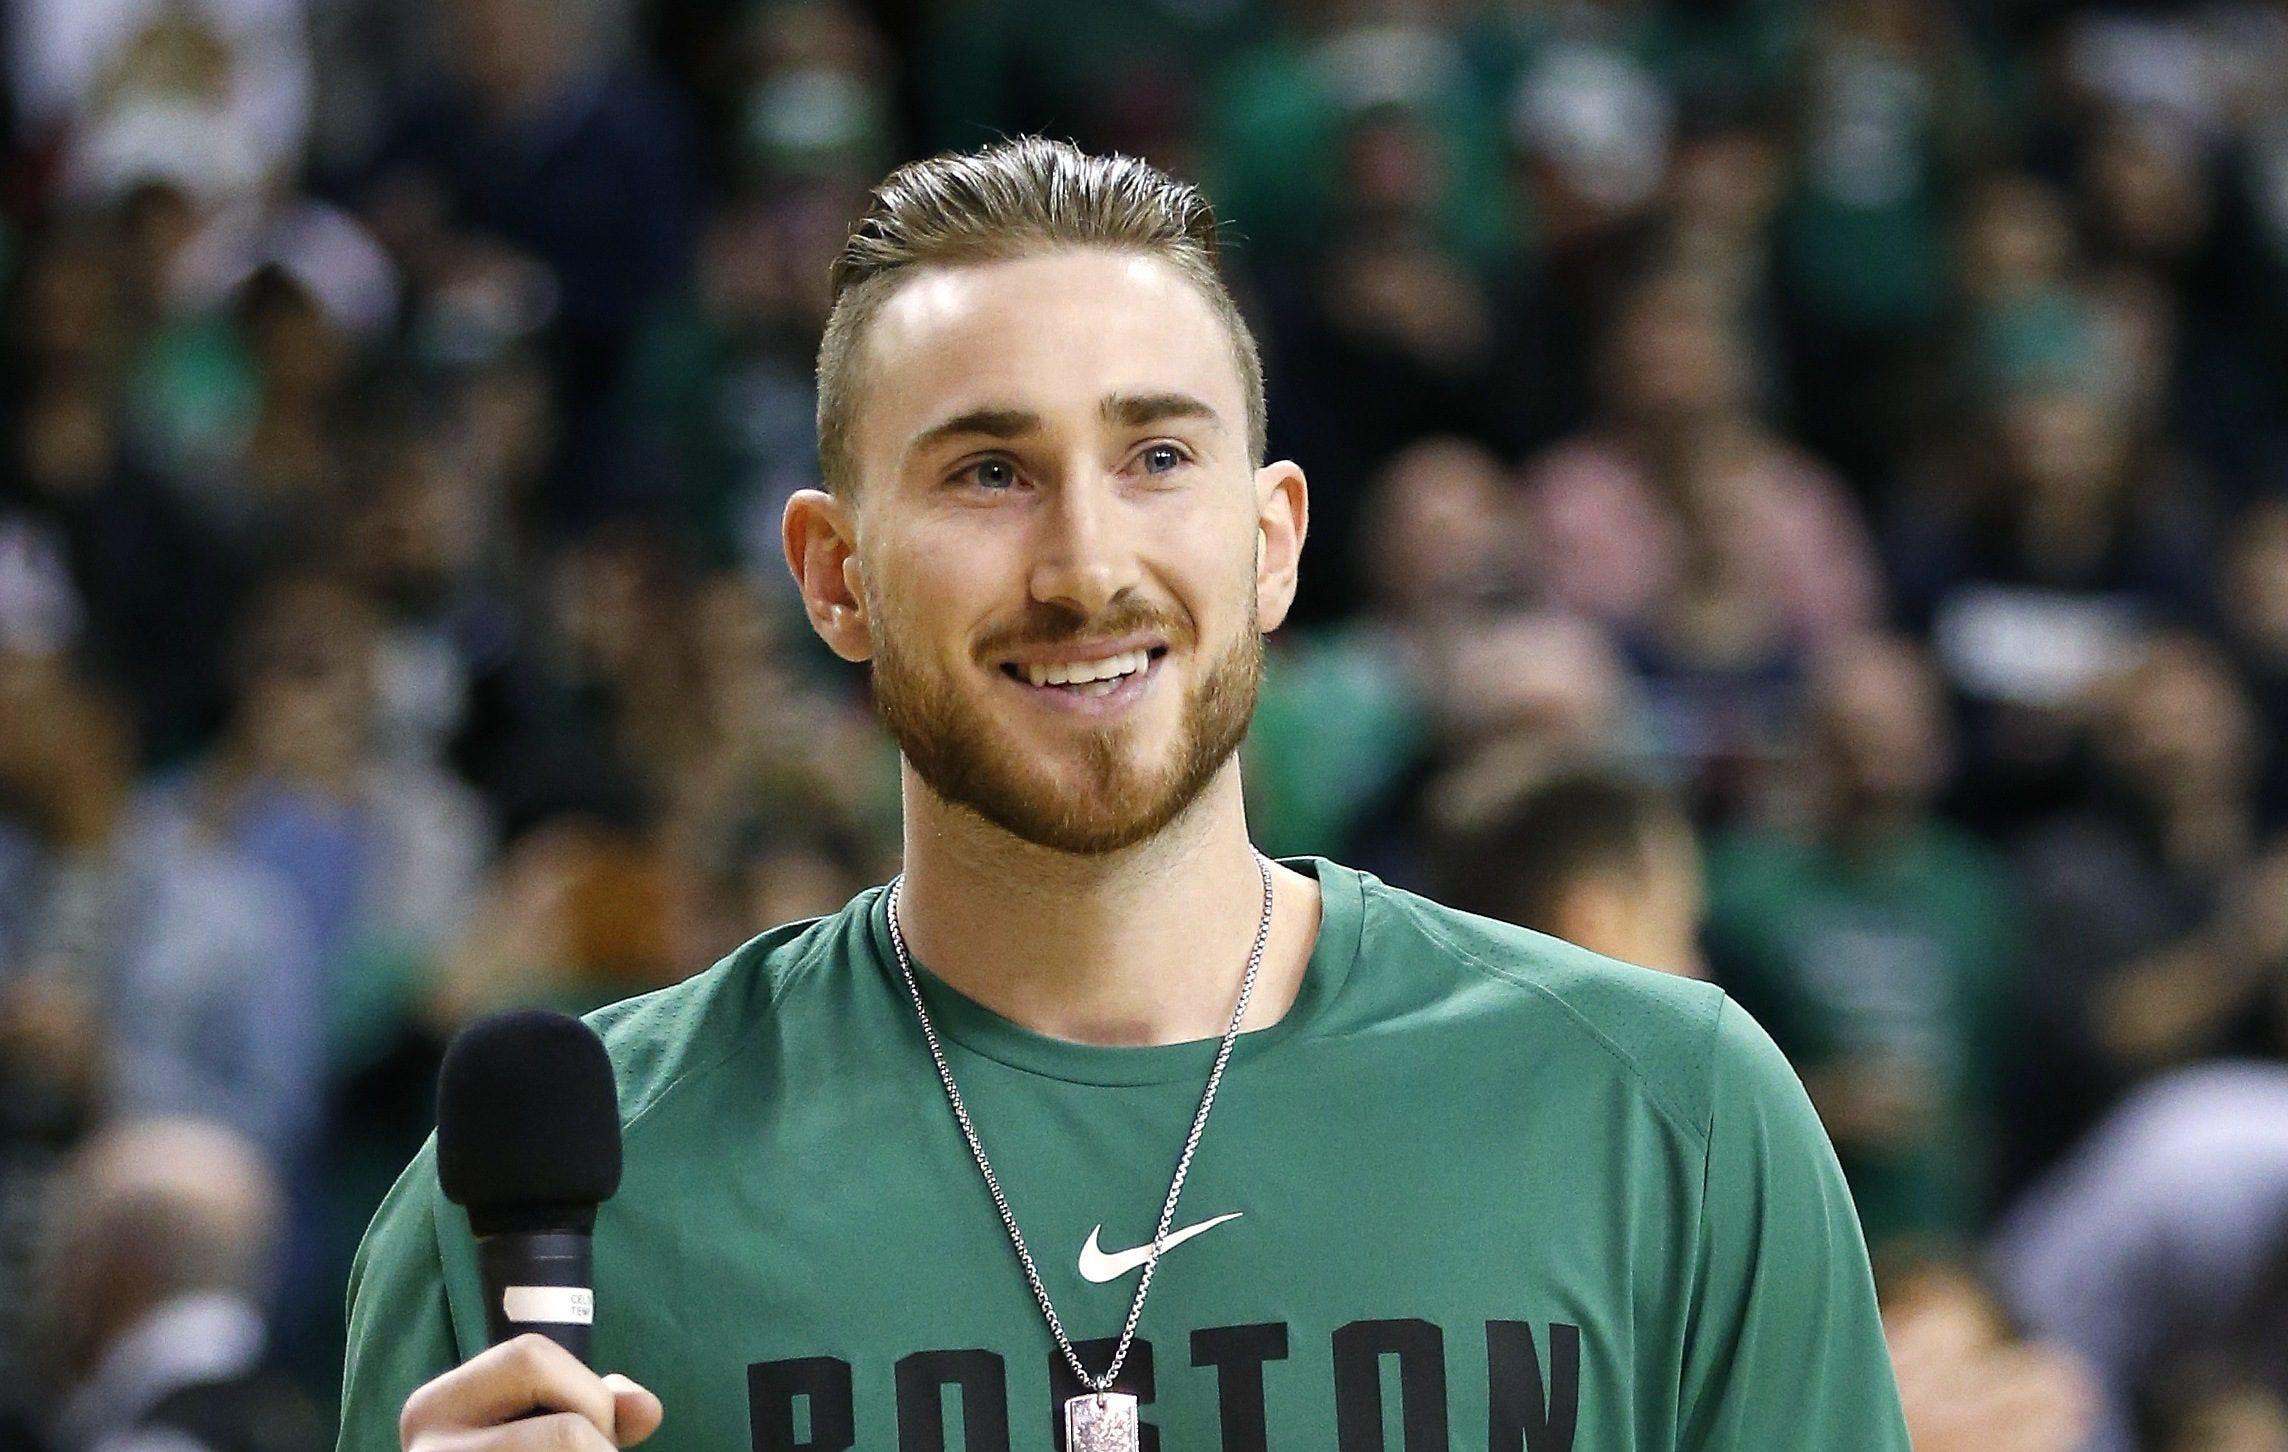 Gordon Hayward asks Celtics fans to chant 'Daddy's always happy'